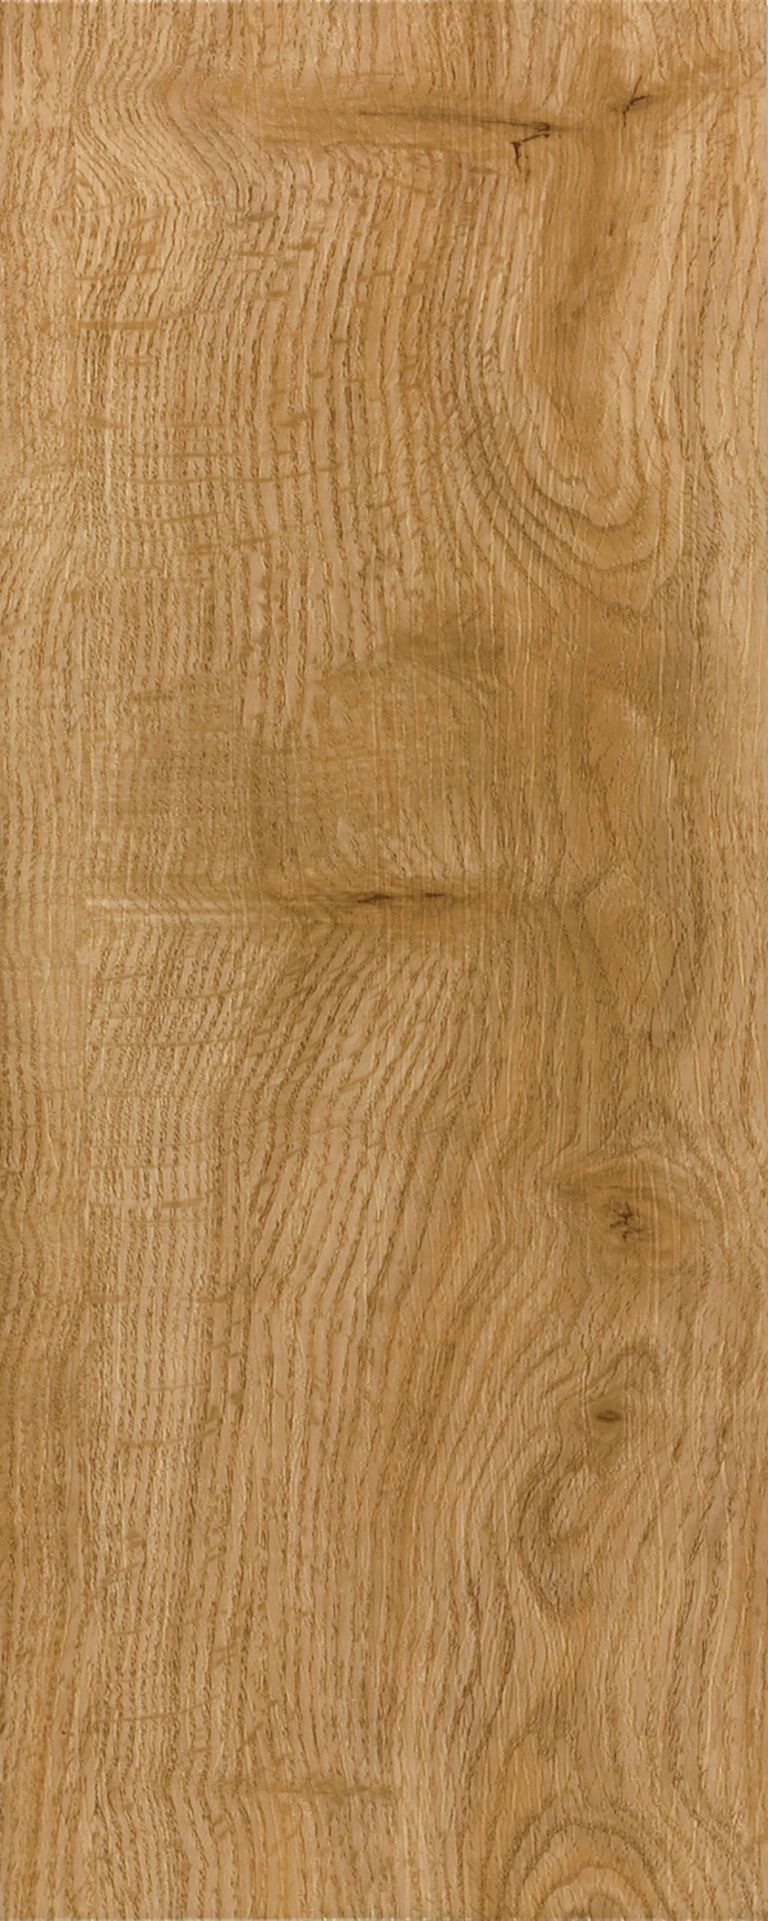 Kendrick Oak - Natural Vinilo de Lujo A6837